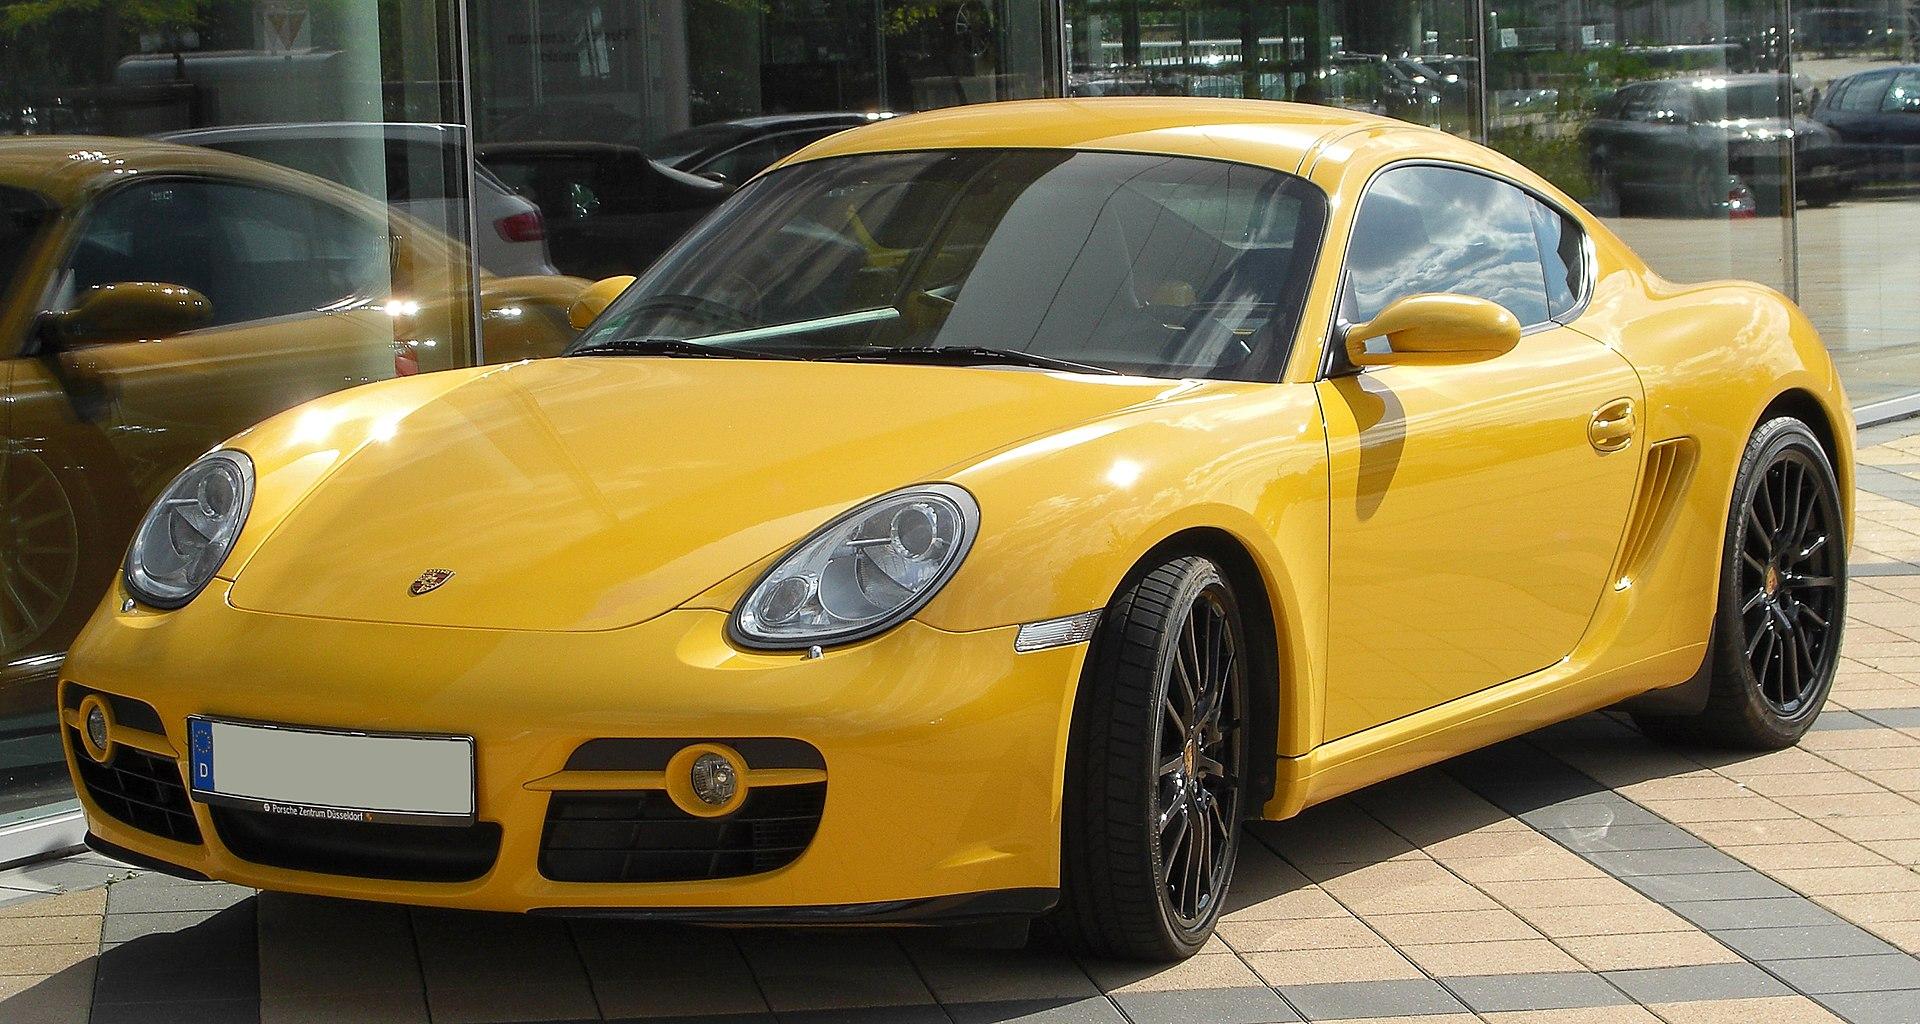 Porsche Cayman Typ 987c Wikipedia